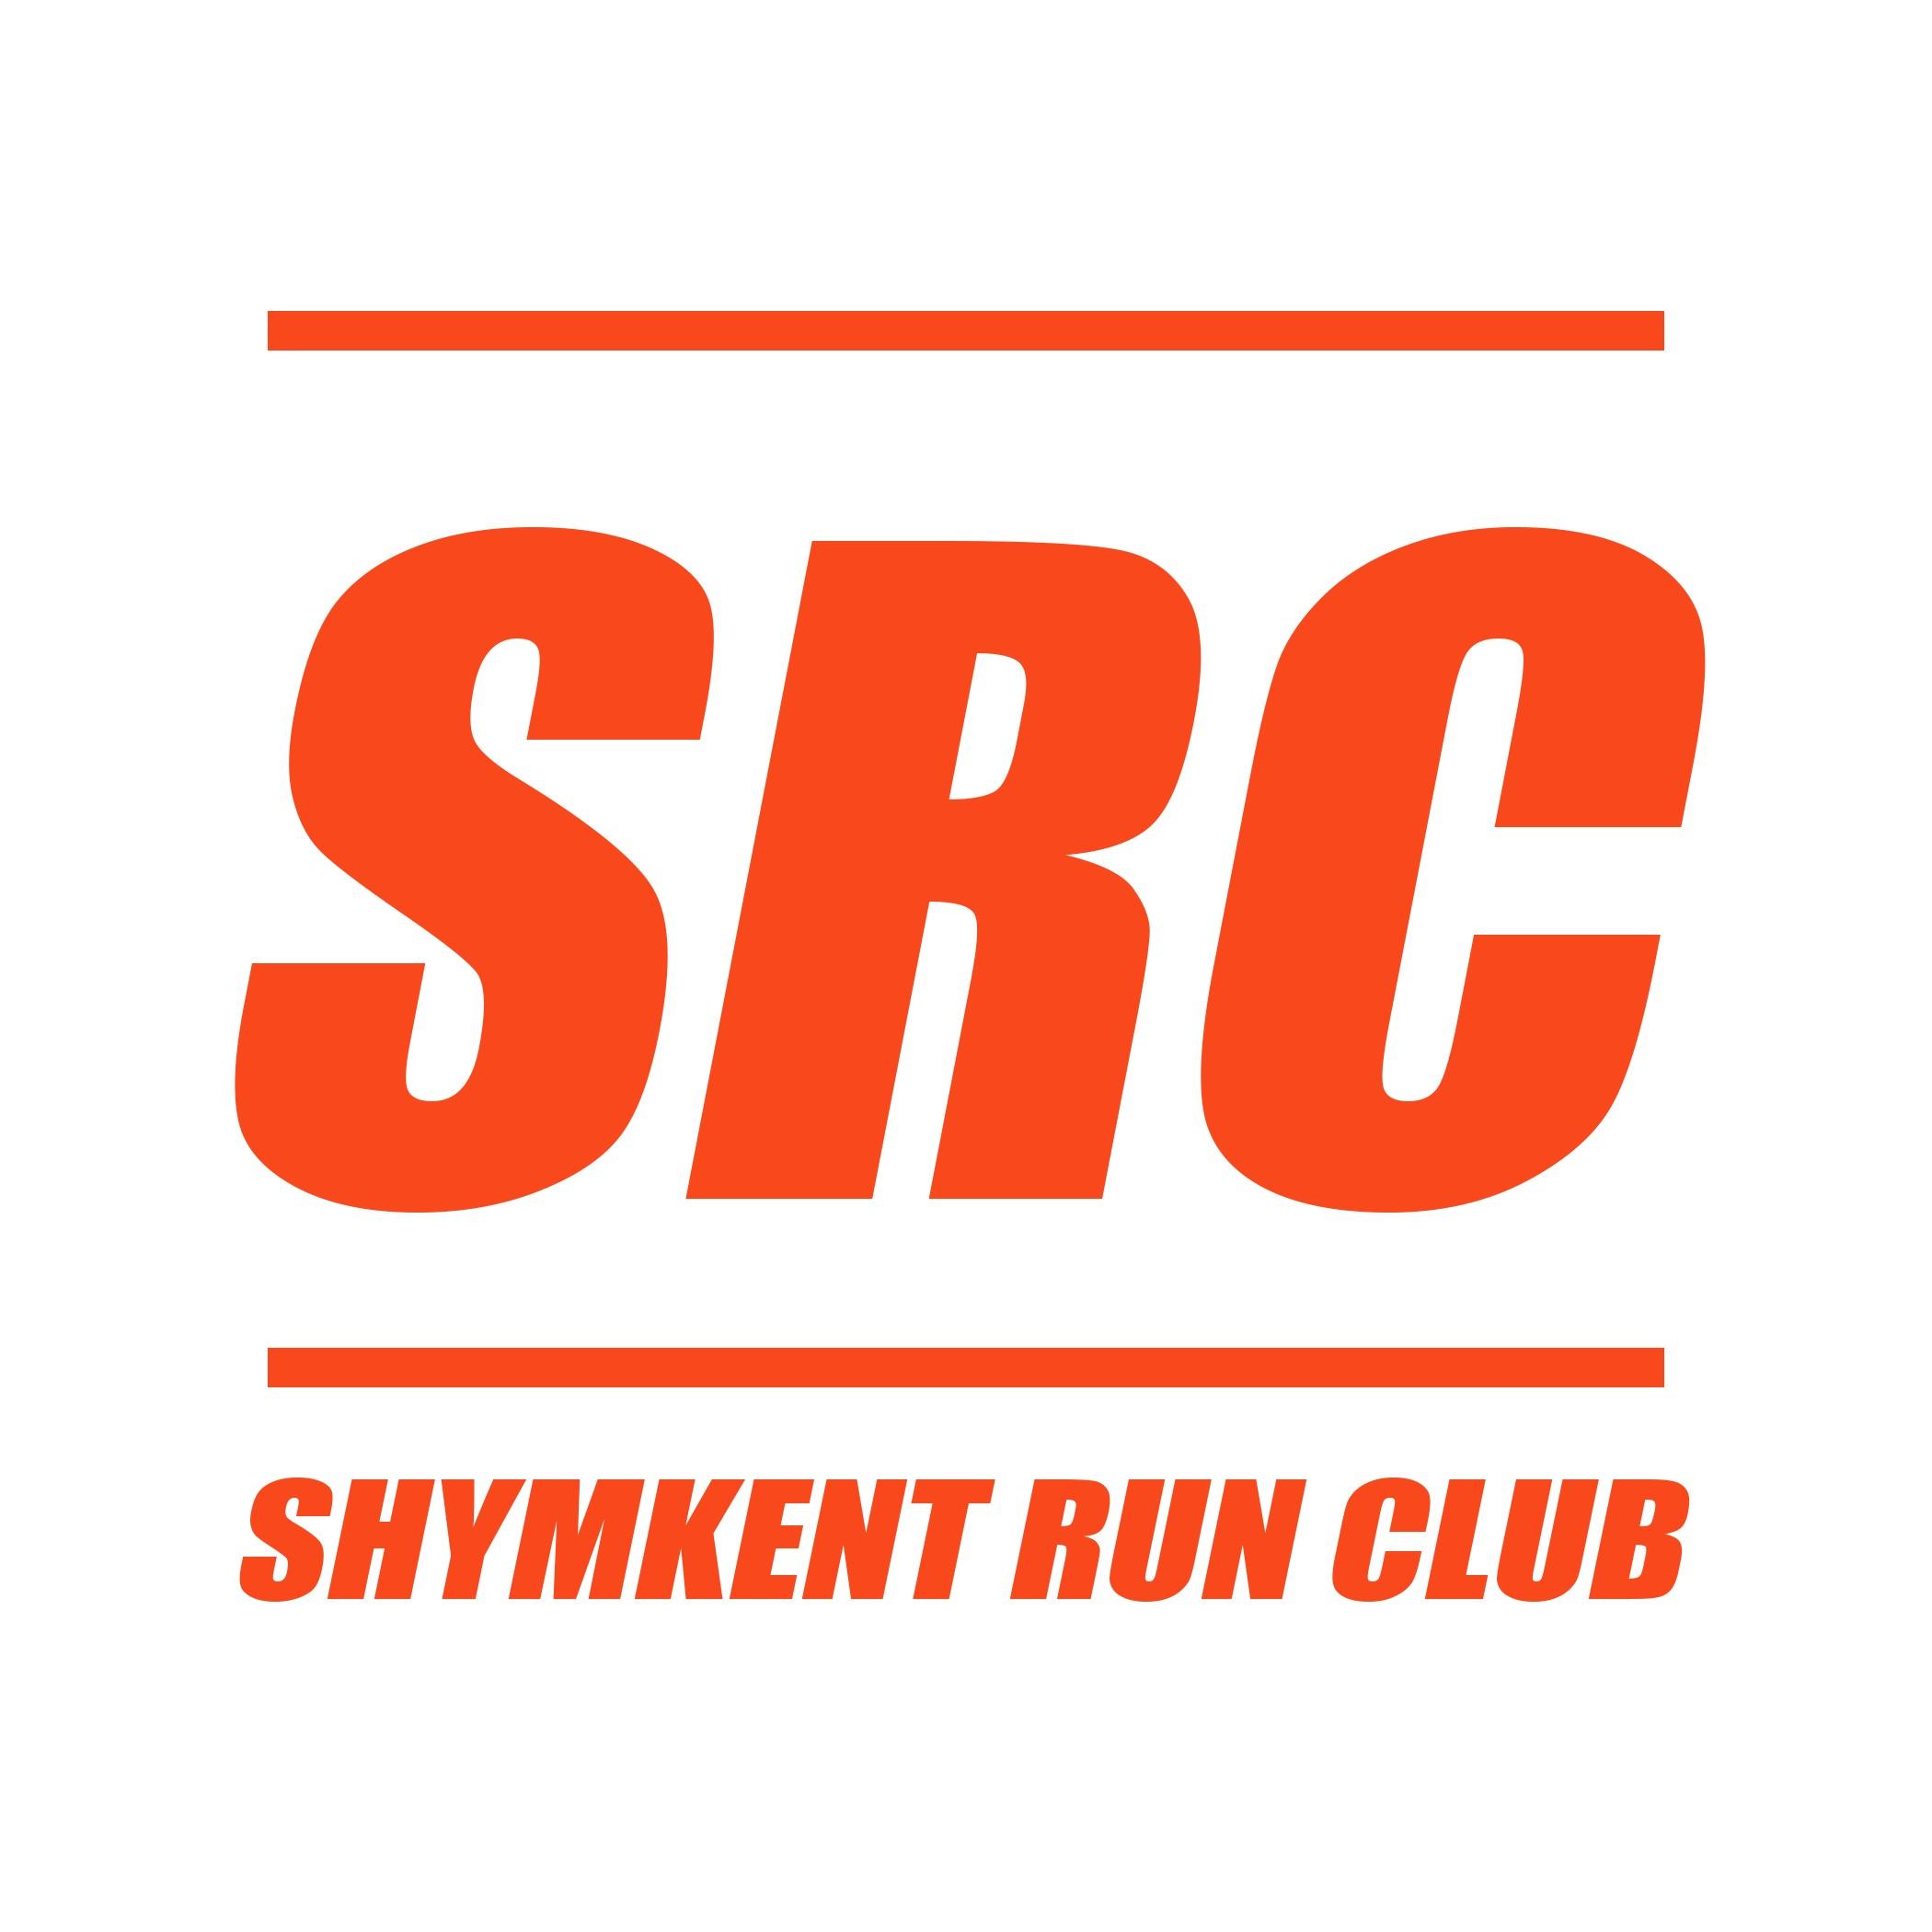 SR Club Logo 3 Orange.jpg